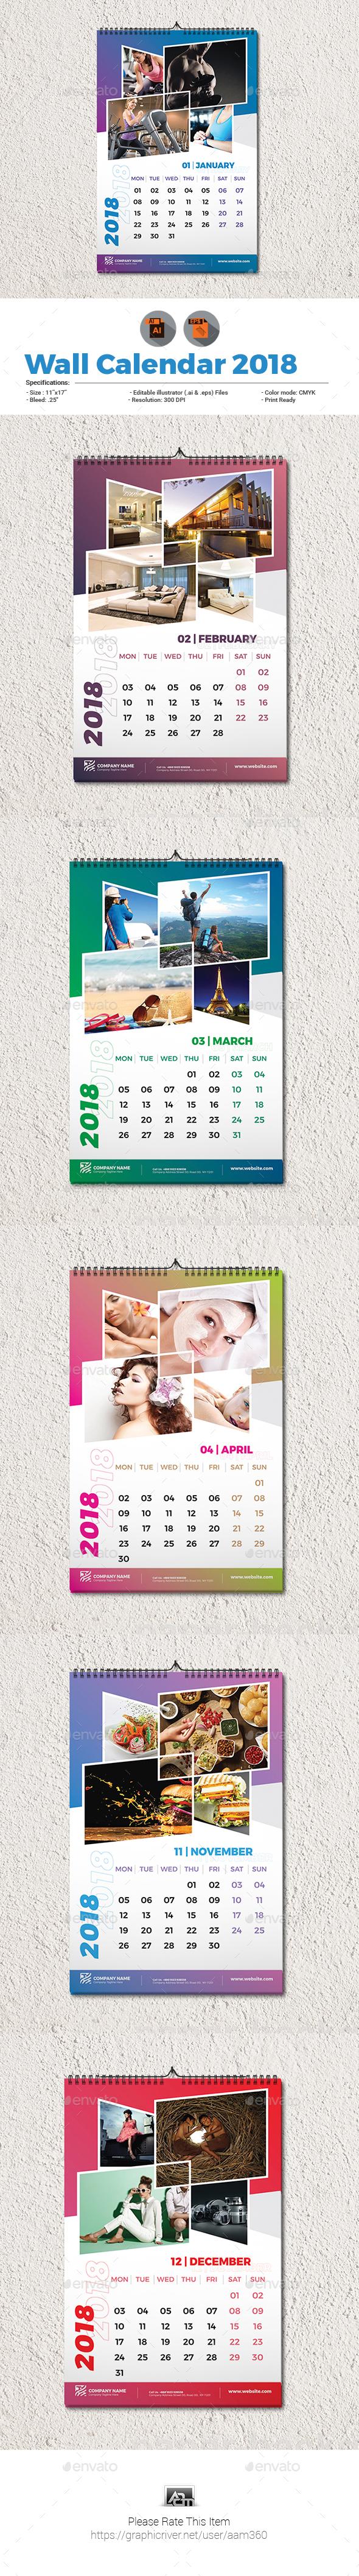 Wall Calendar 2018 Template - Calendars Stationery